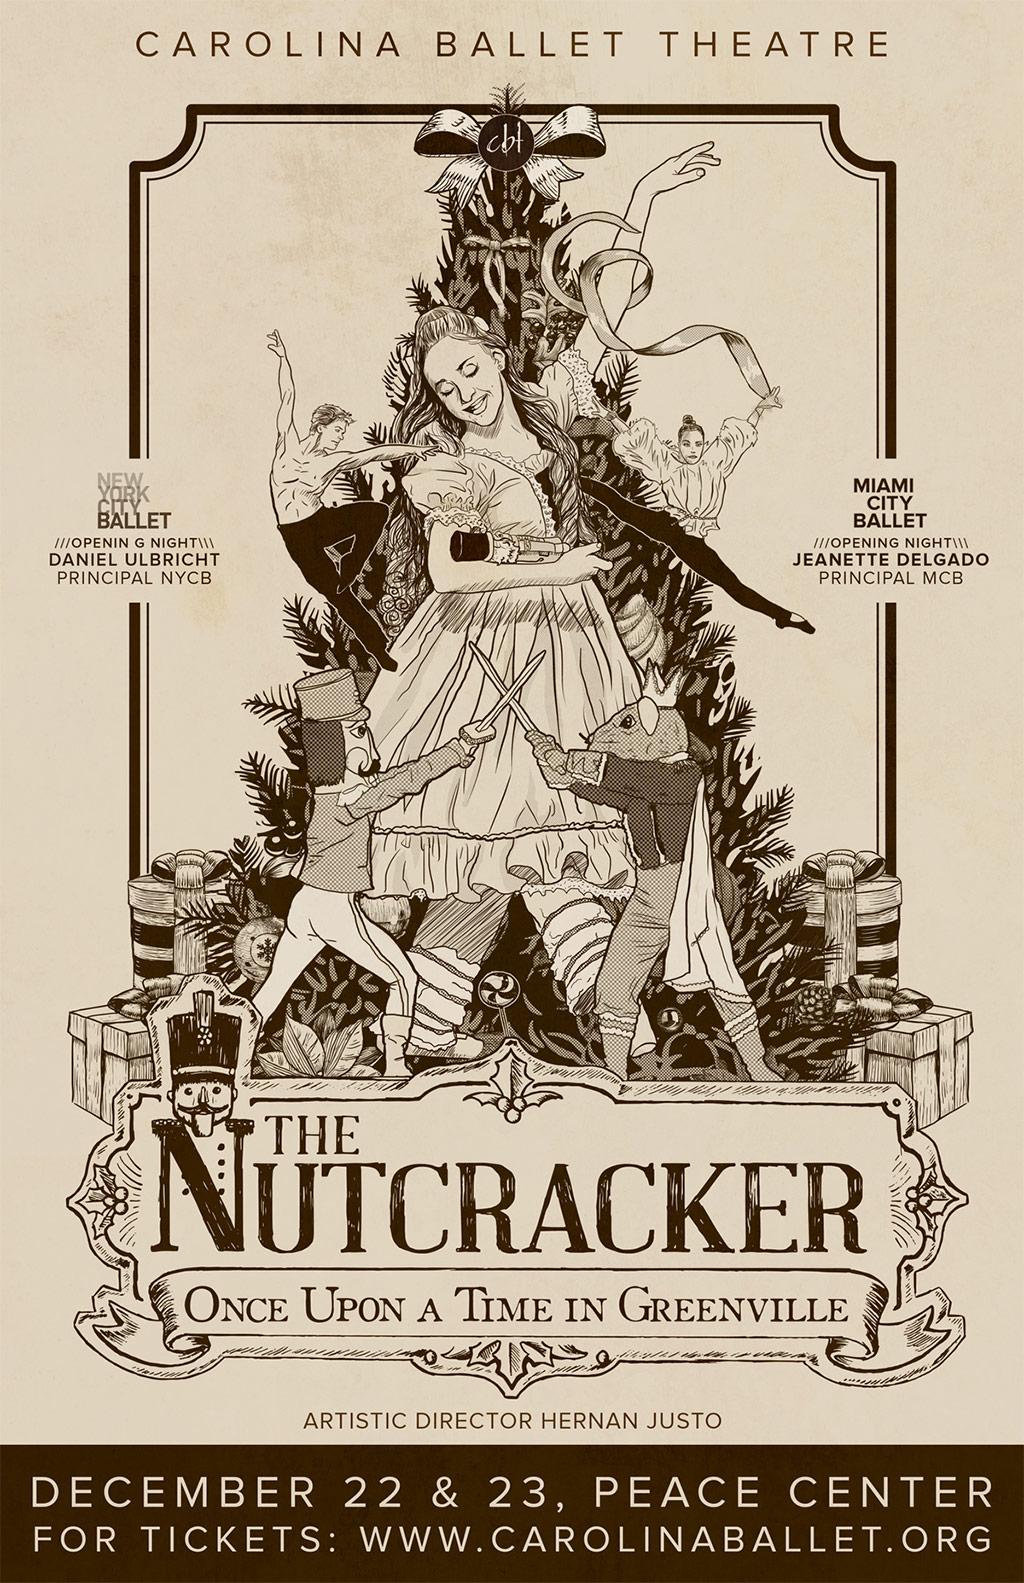 nutcracker-image-20162